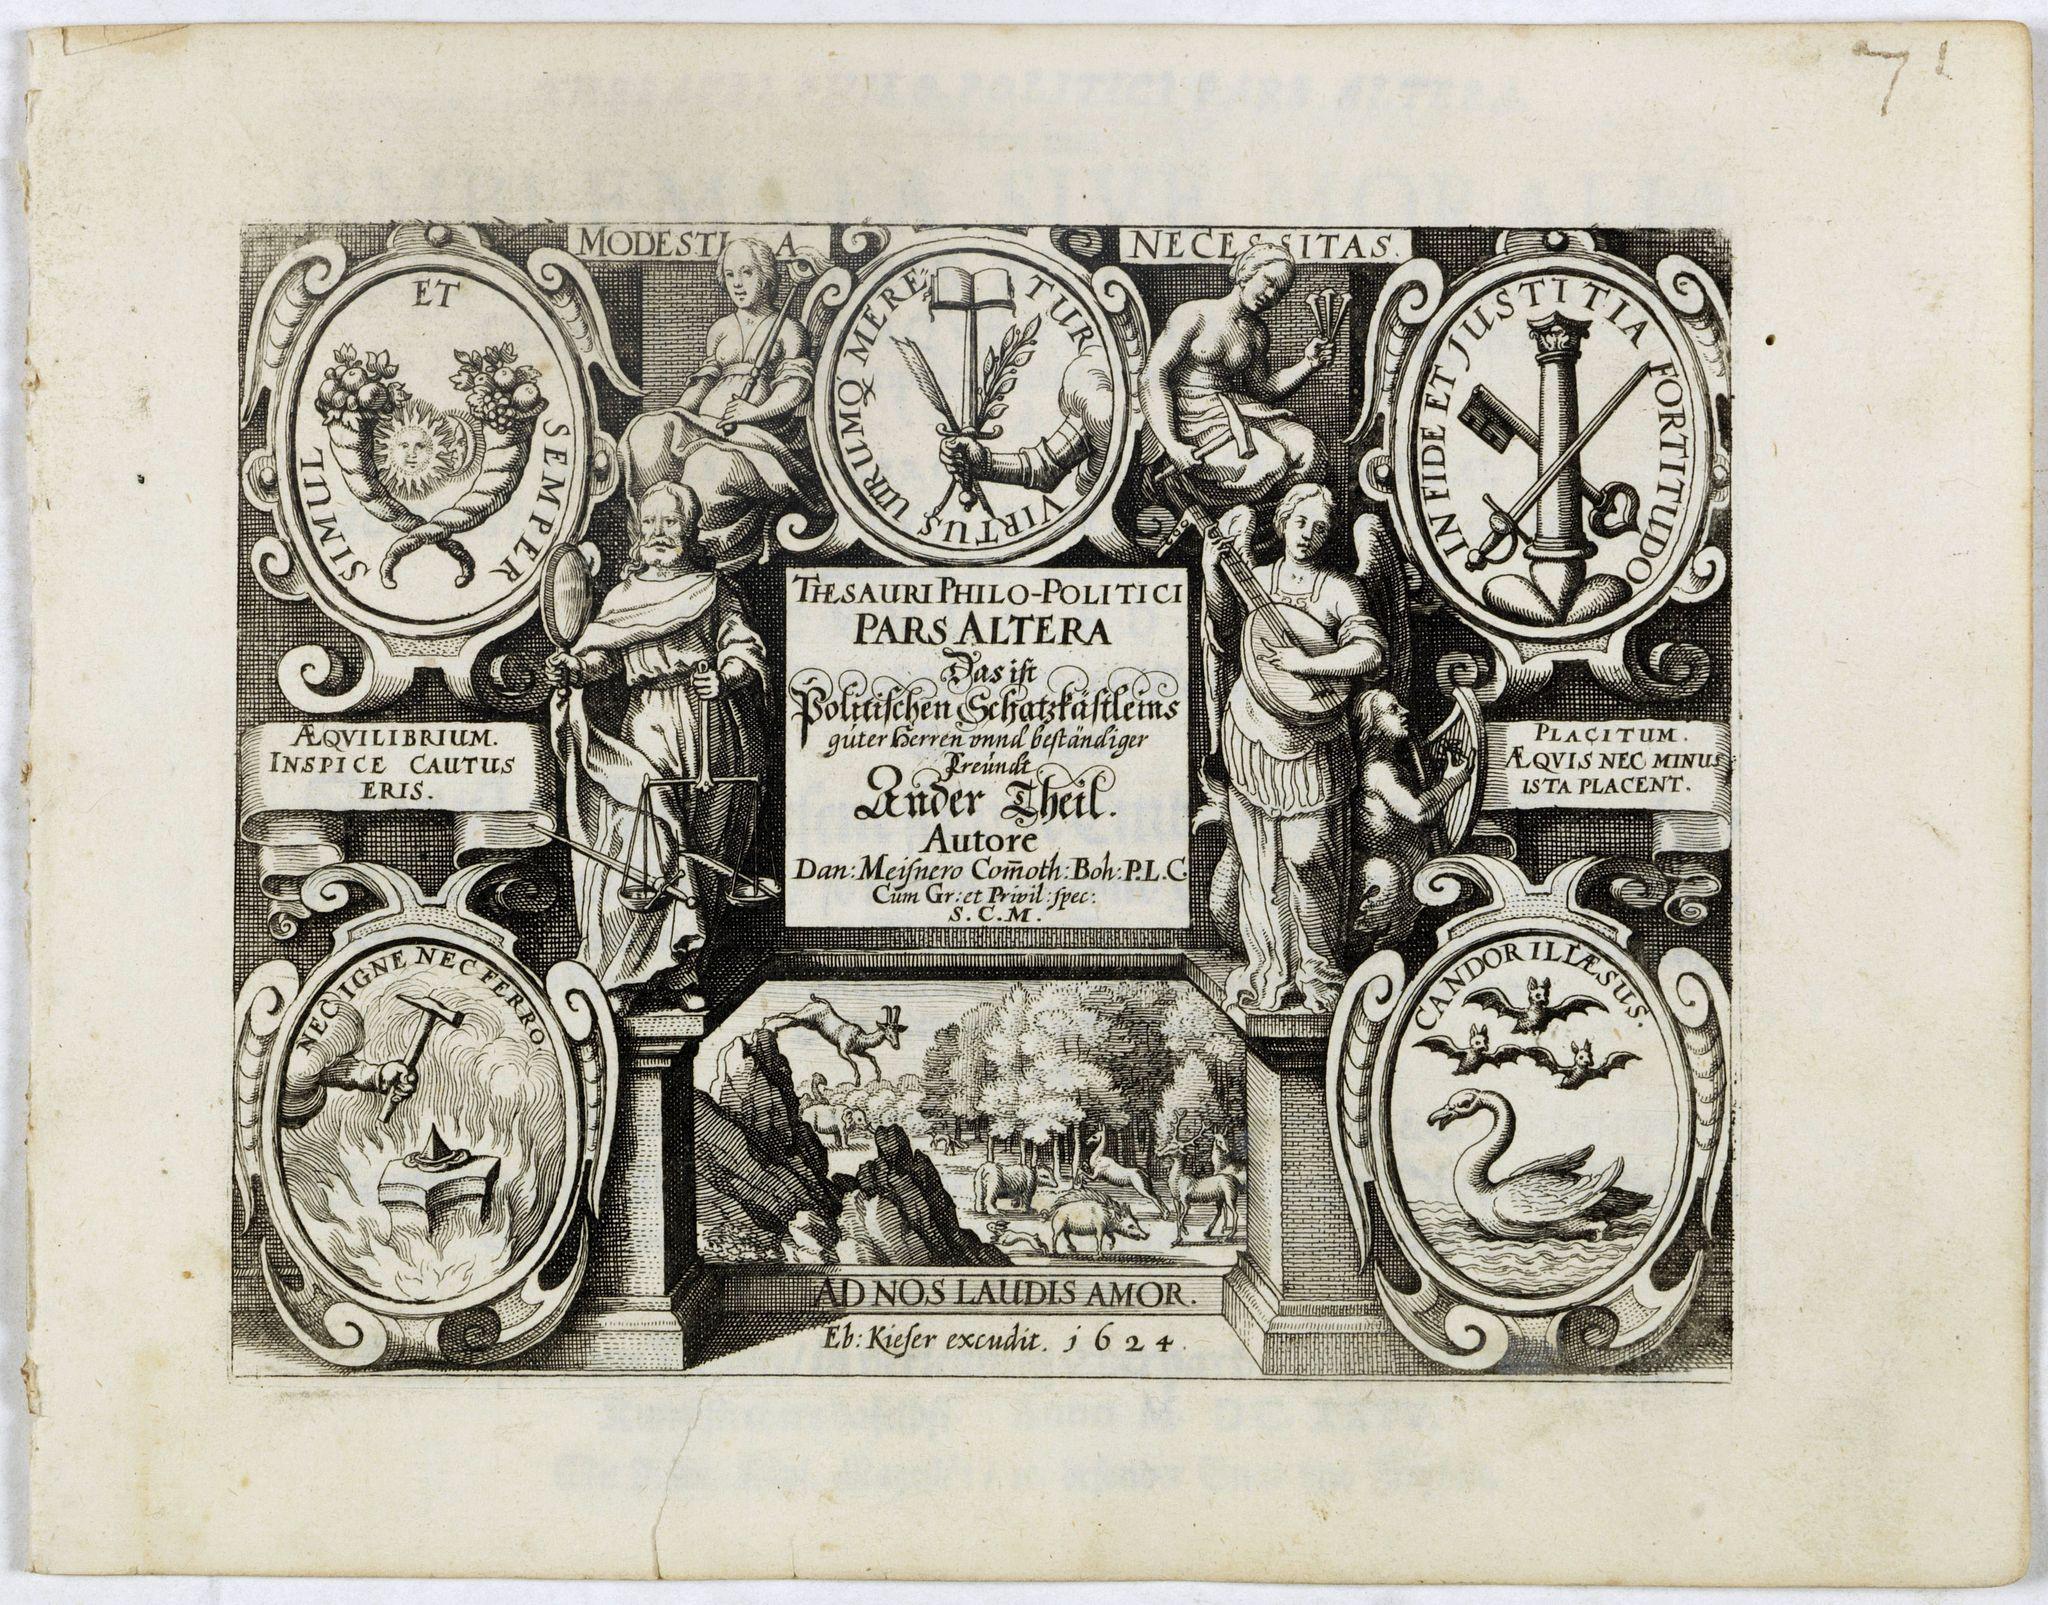 MEISNER, D. -  [Title page] Thesauri Philo-Politci pars Altera. . .